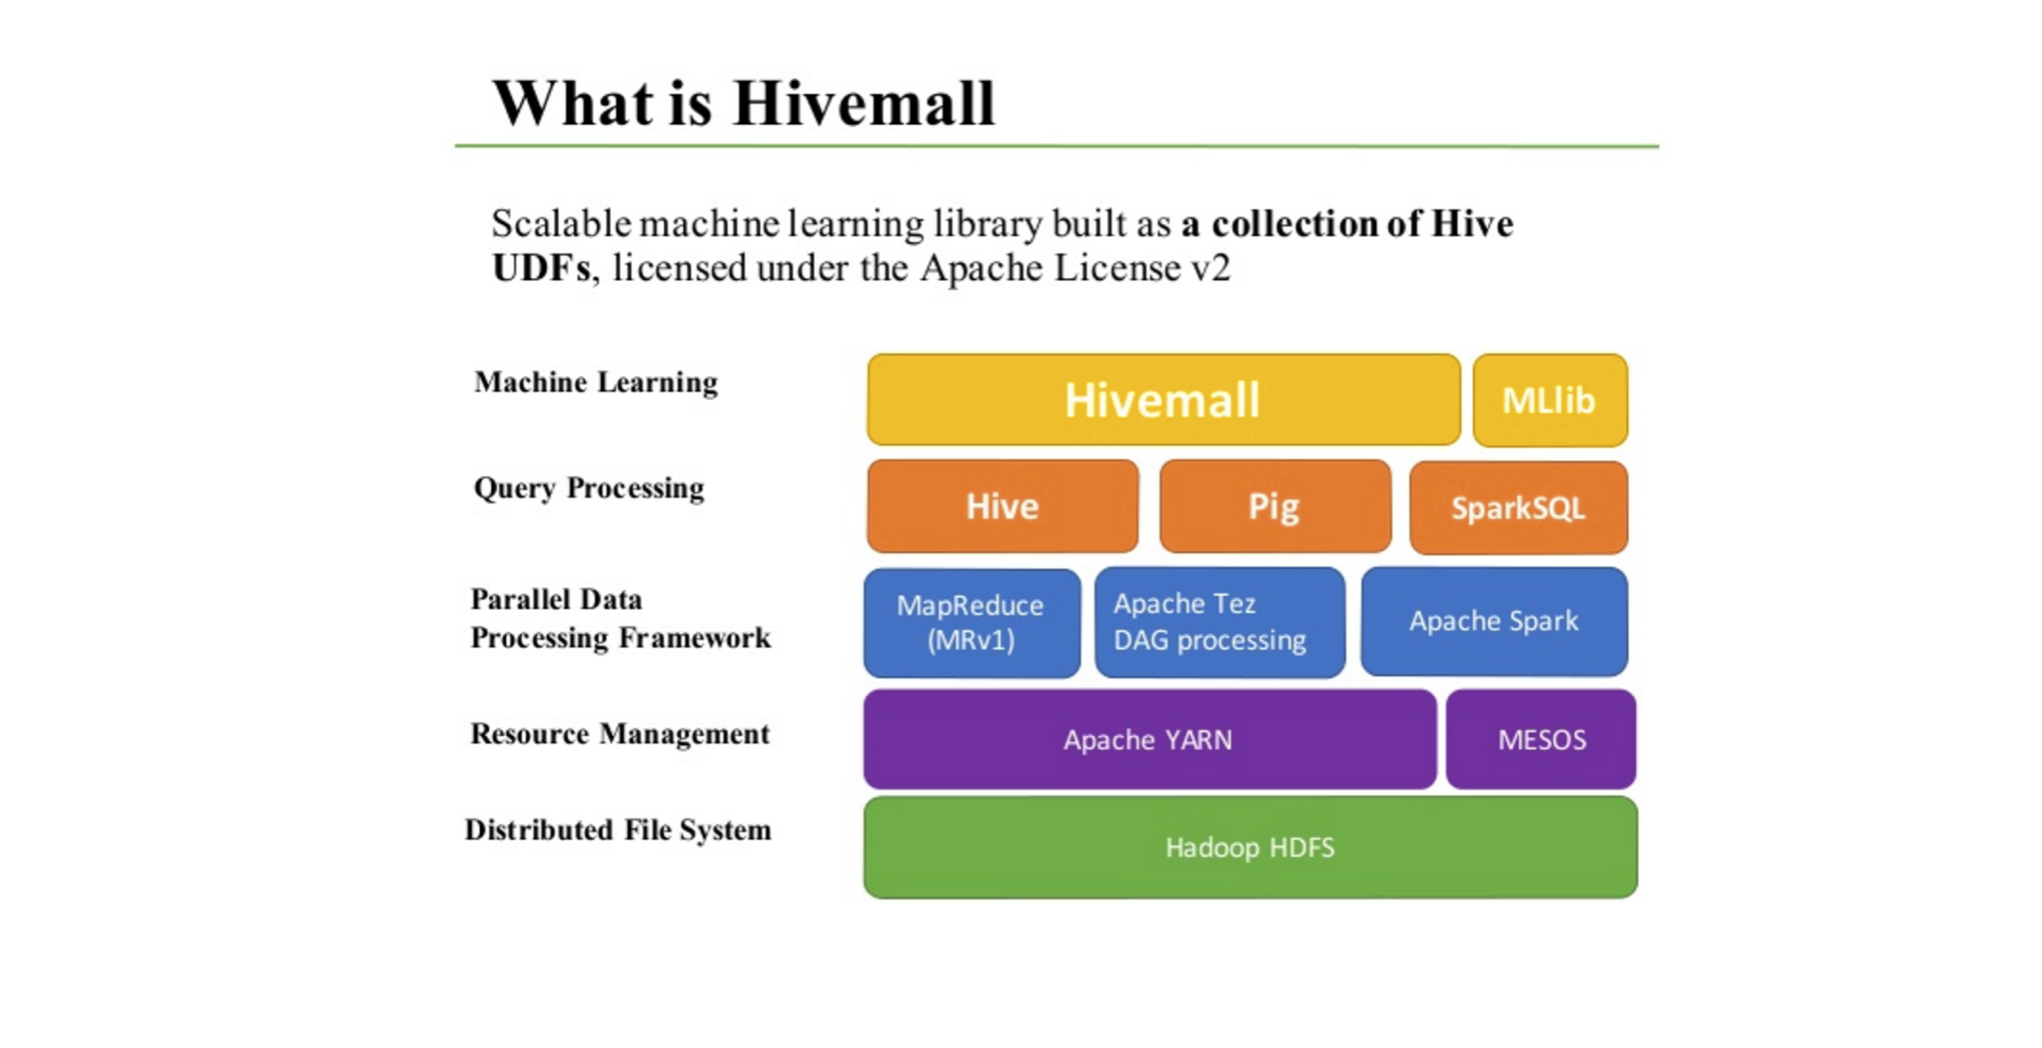 基于 Hive UDF 的机器学习算法工具 Apache Hivemall